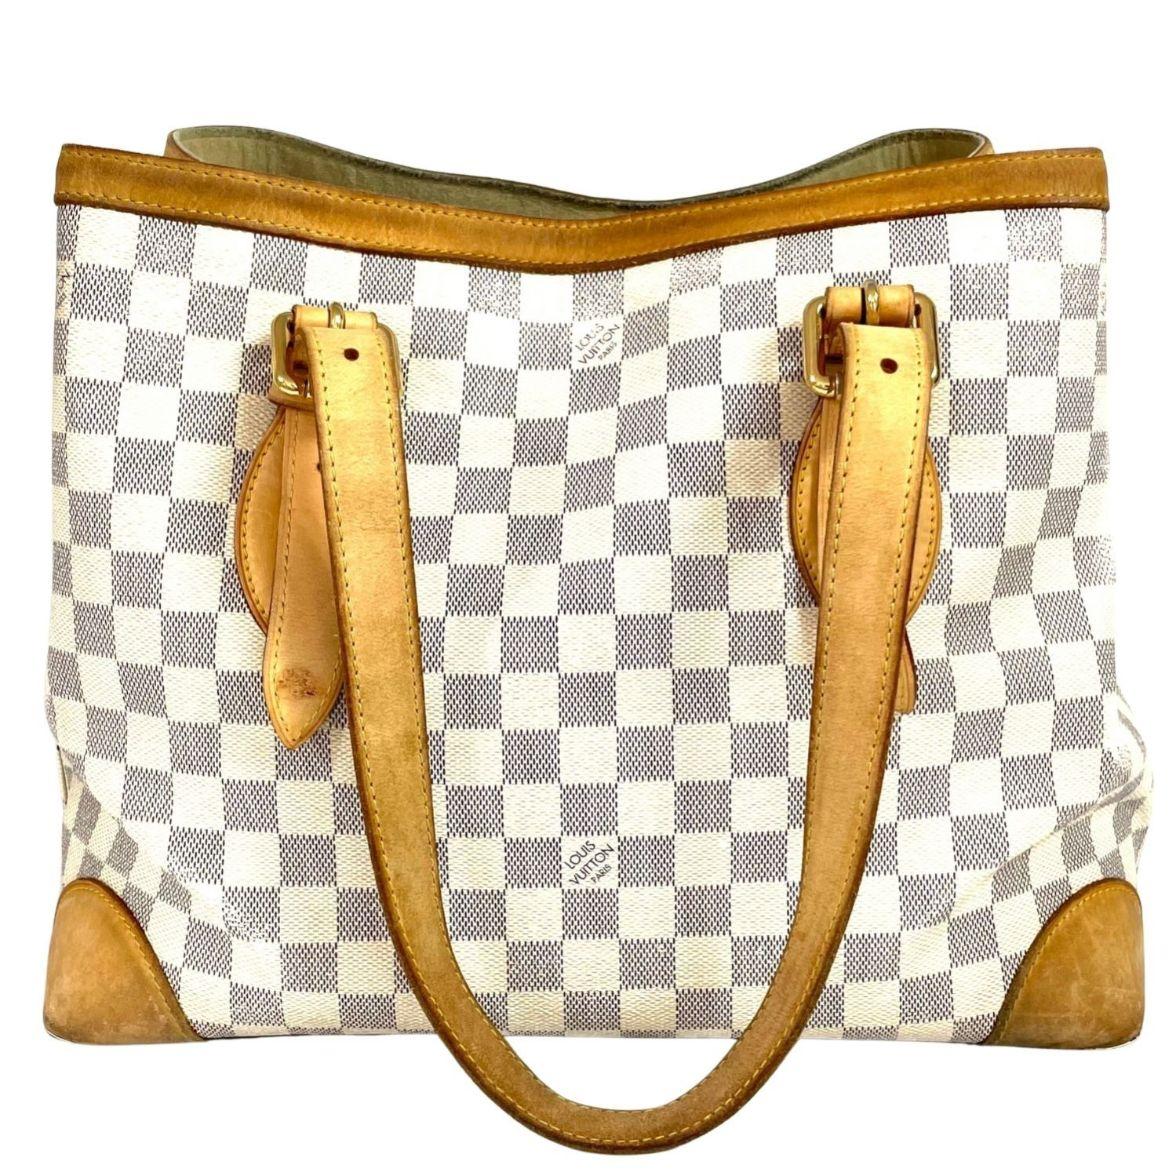 Bolsa Louis Vuitton Hampstead MM Damier Azur